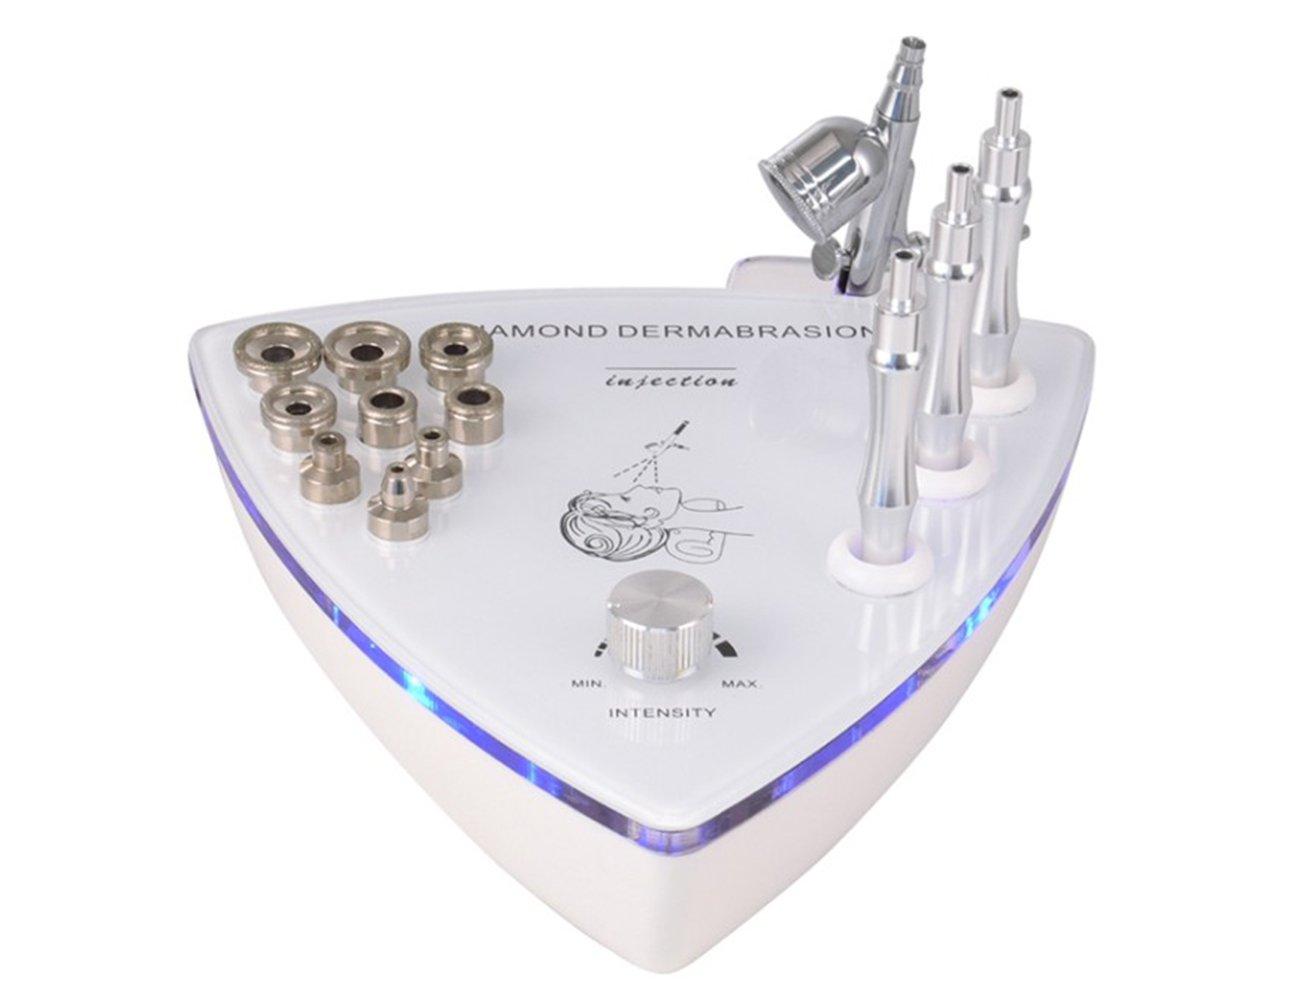 Facial Beauty Sprayer 2 In 1 Diamond Micro Dermabrasion Spraying Machine Elitzia ETLB197